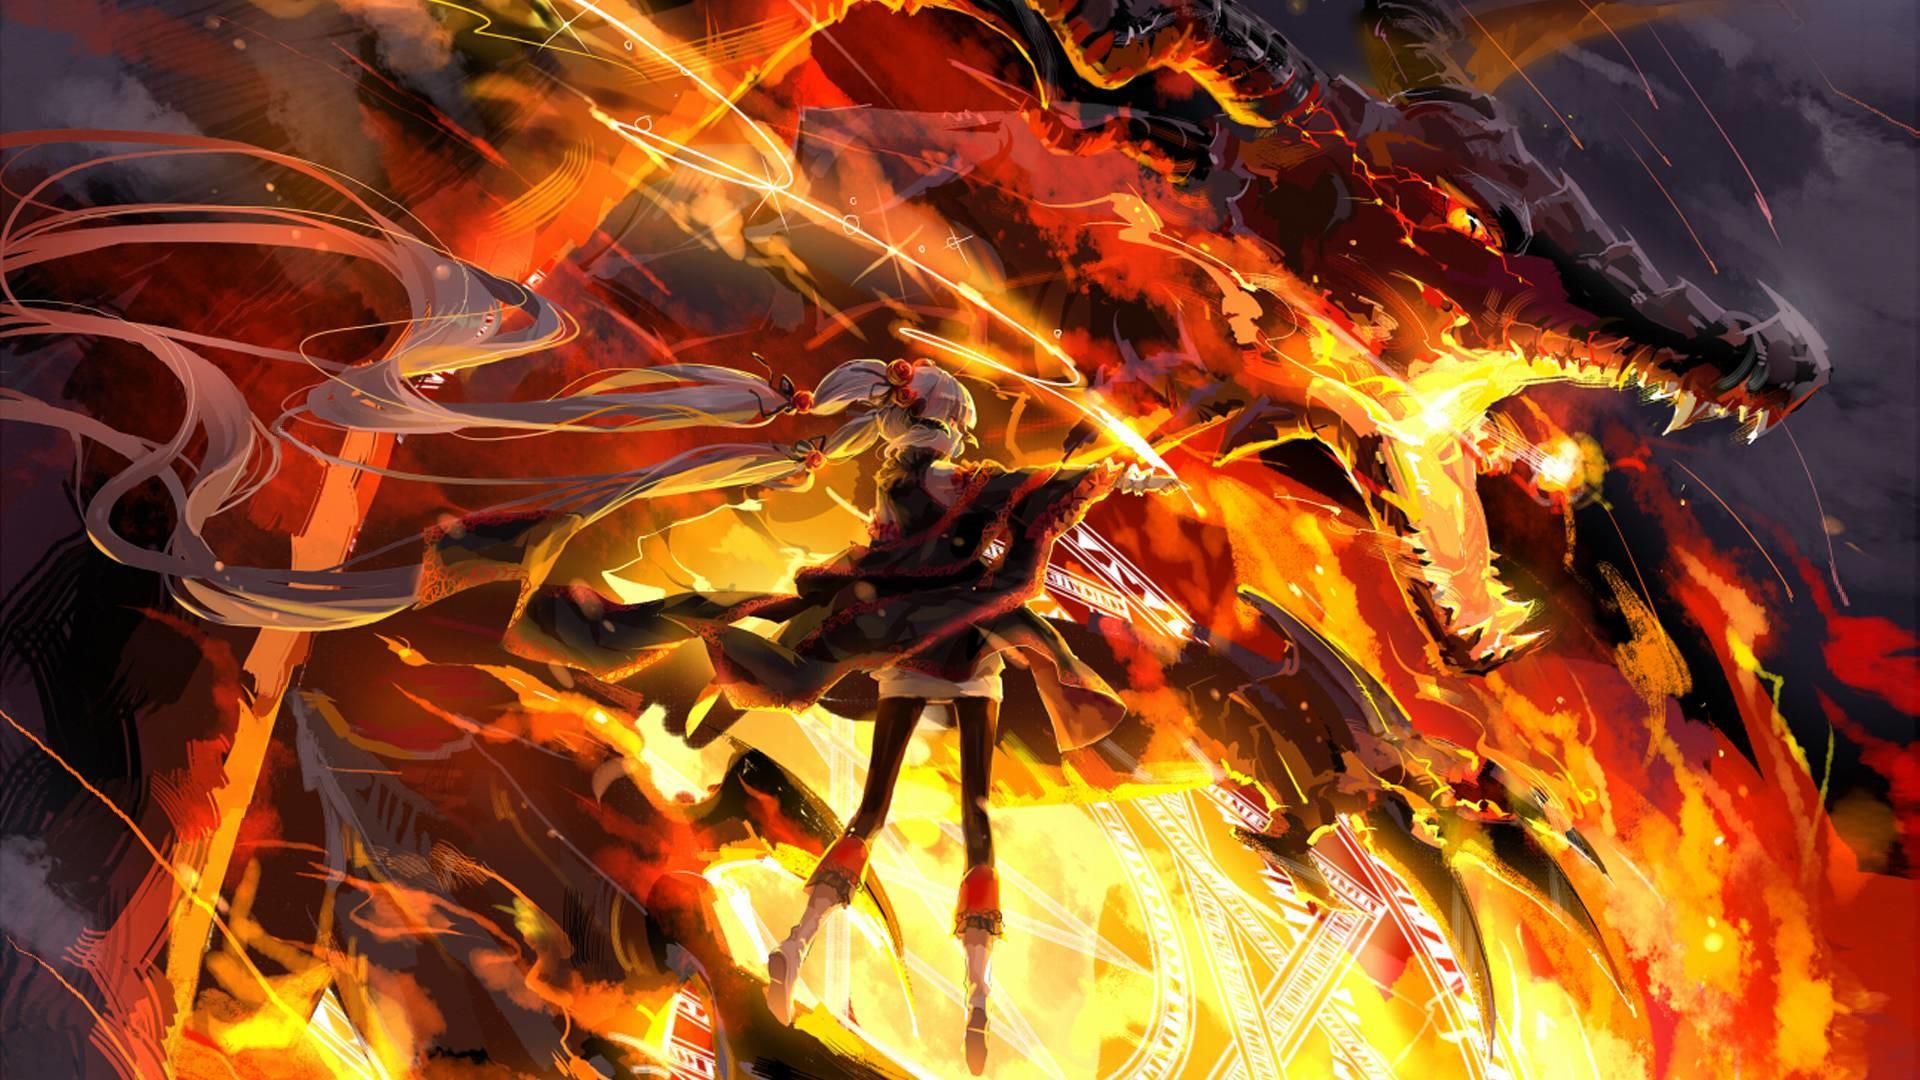 Fire Dragon Wallpaper ·①